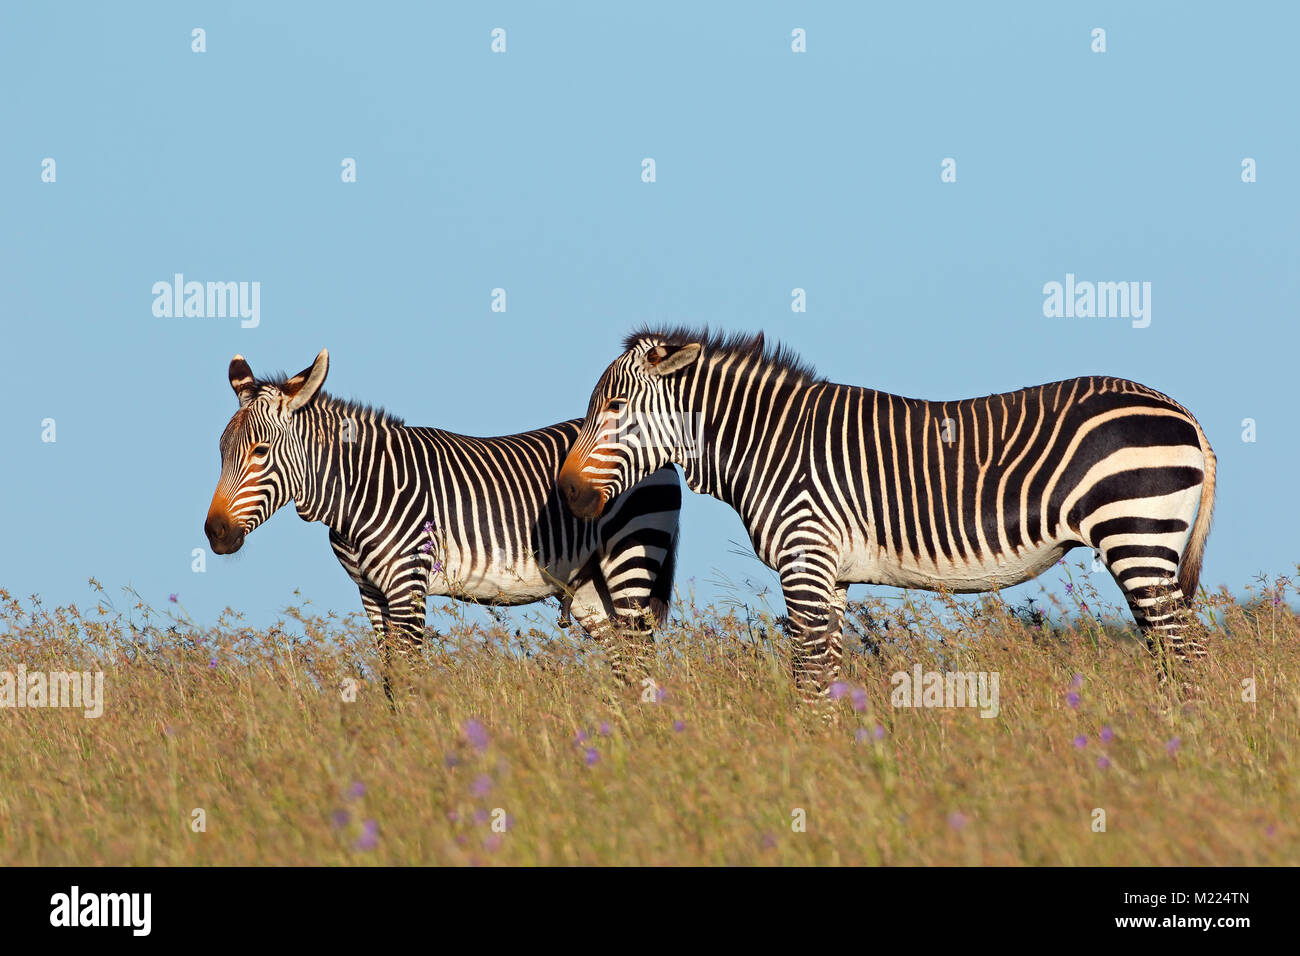 Cape mountain zebras (Equus zebra) in grassland, Mountain Zebra National Park, South Africa - Stock Image